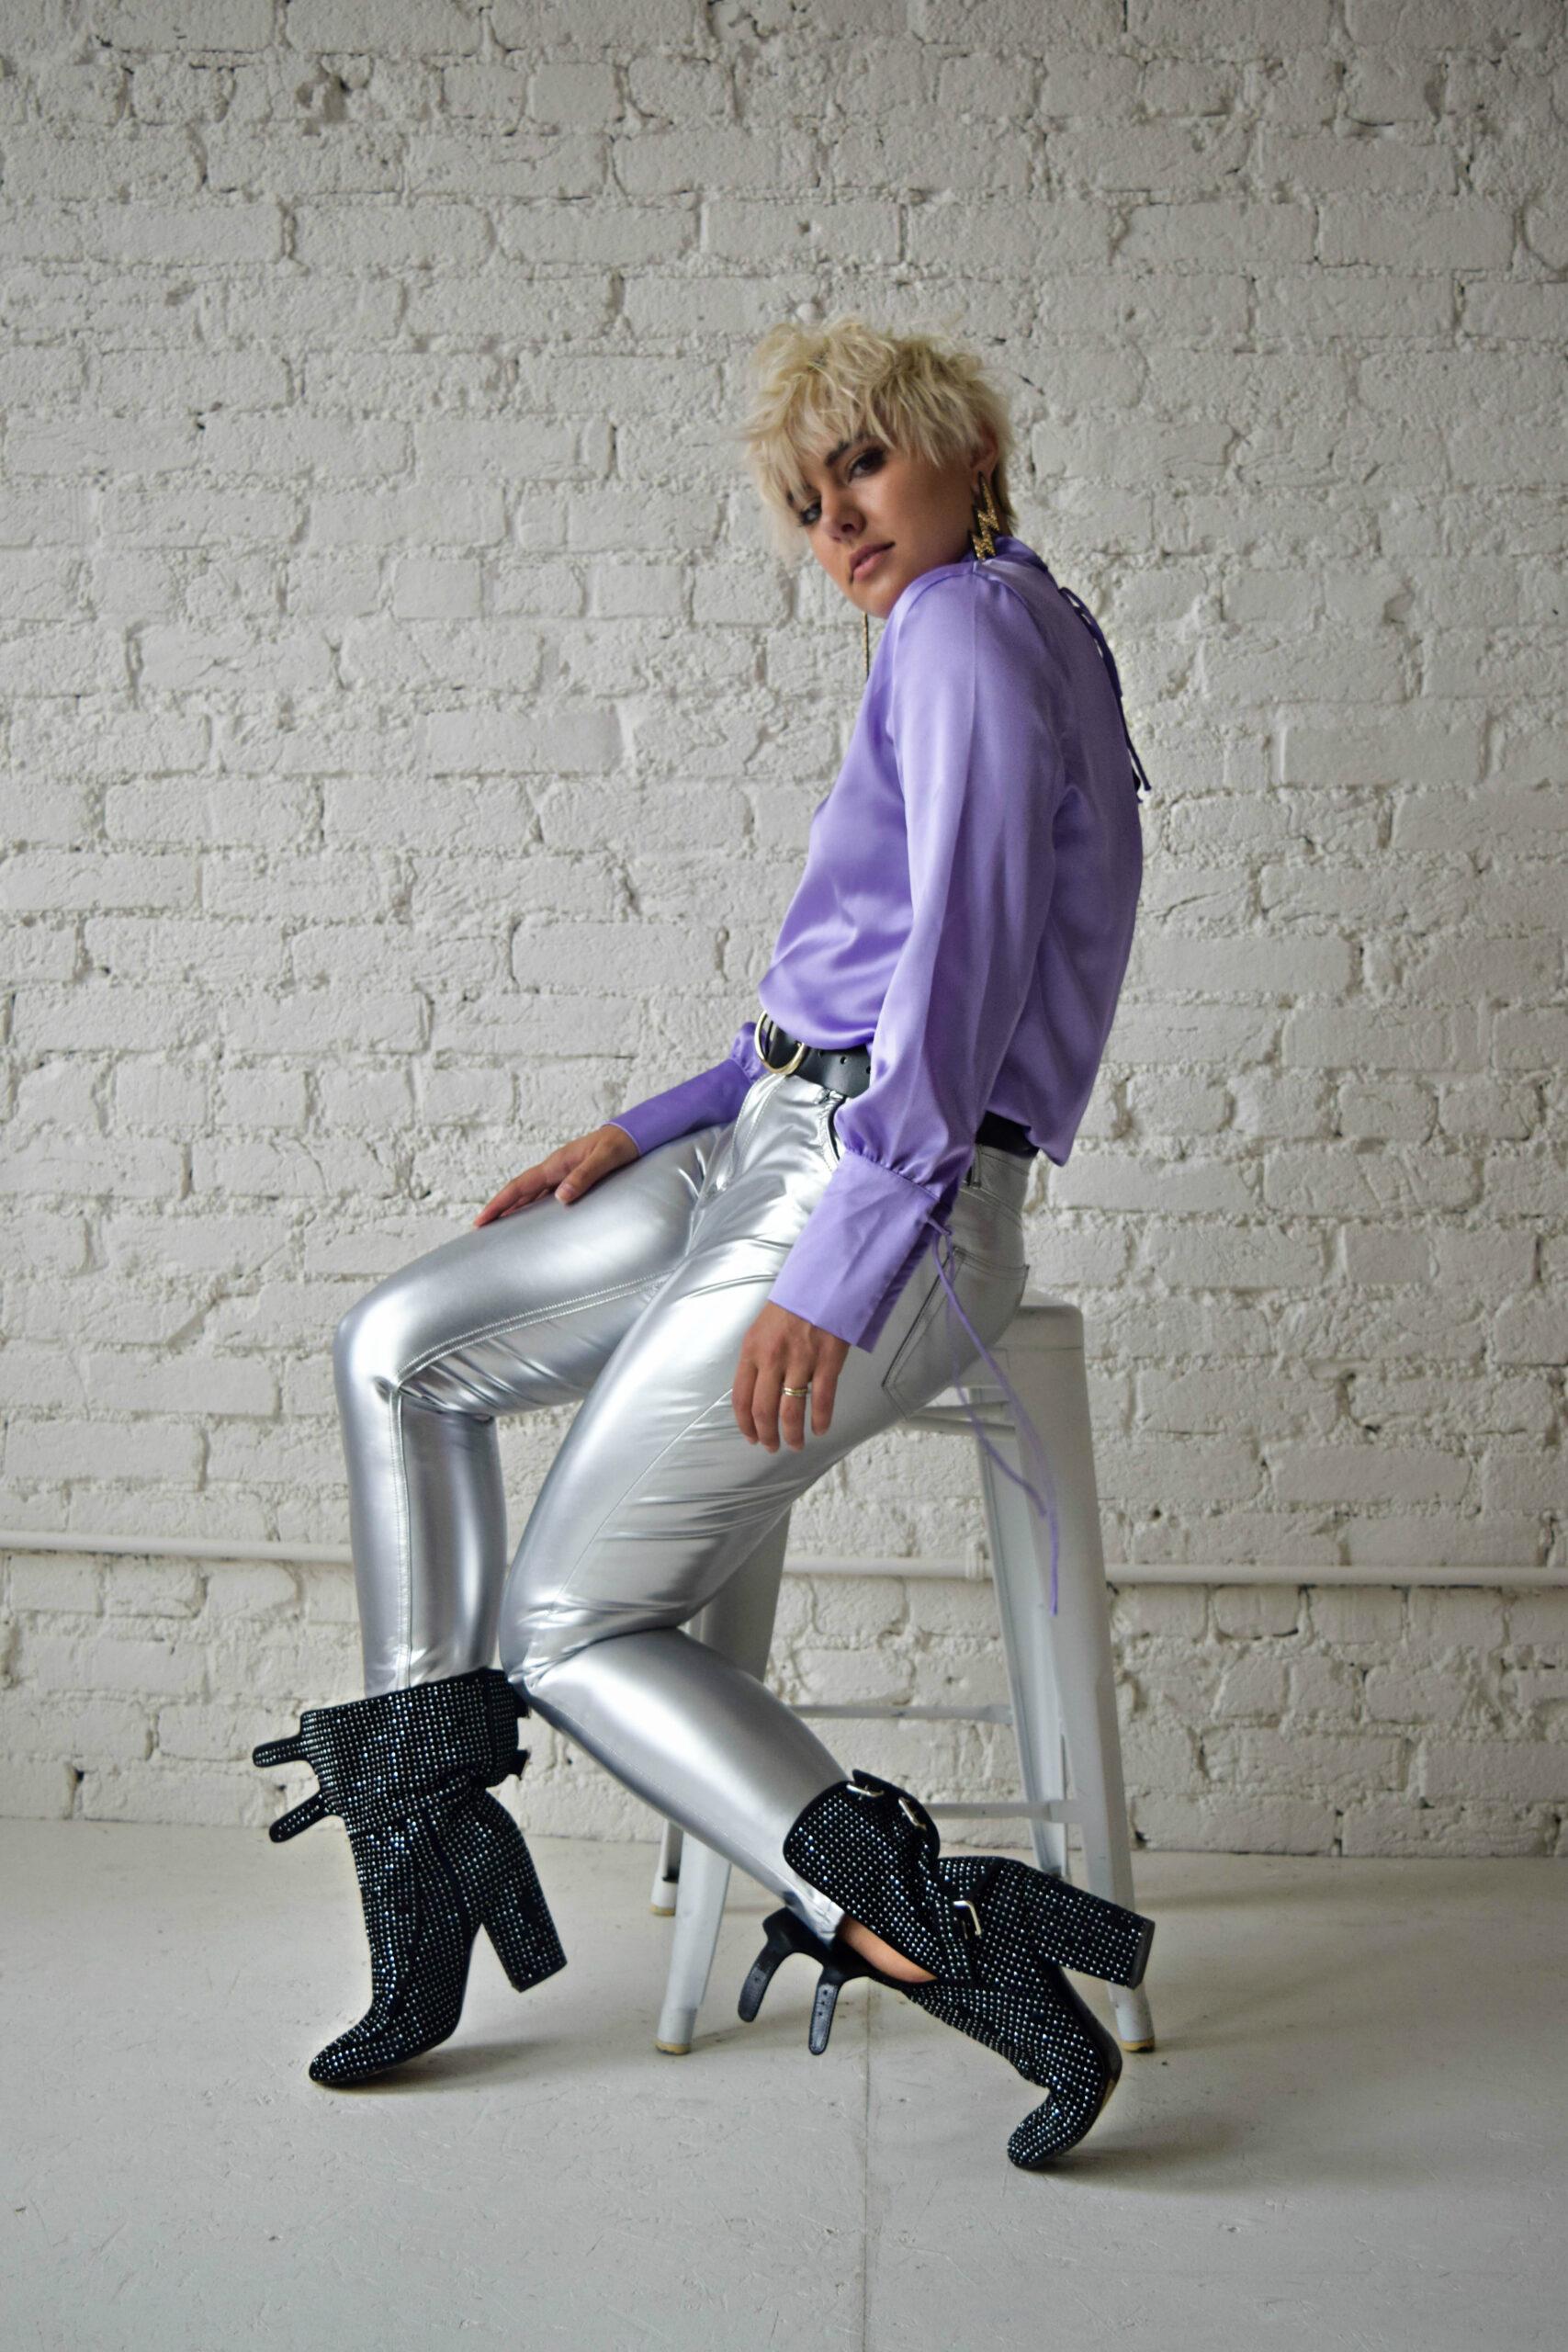 The Futurist: Embracing Your 80's Alter-Ego Using Modern Clothing - BloggerNotBillionaire.com